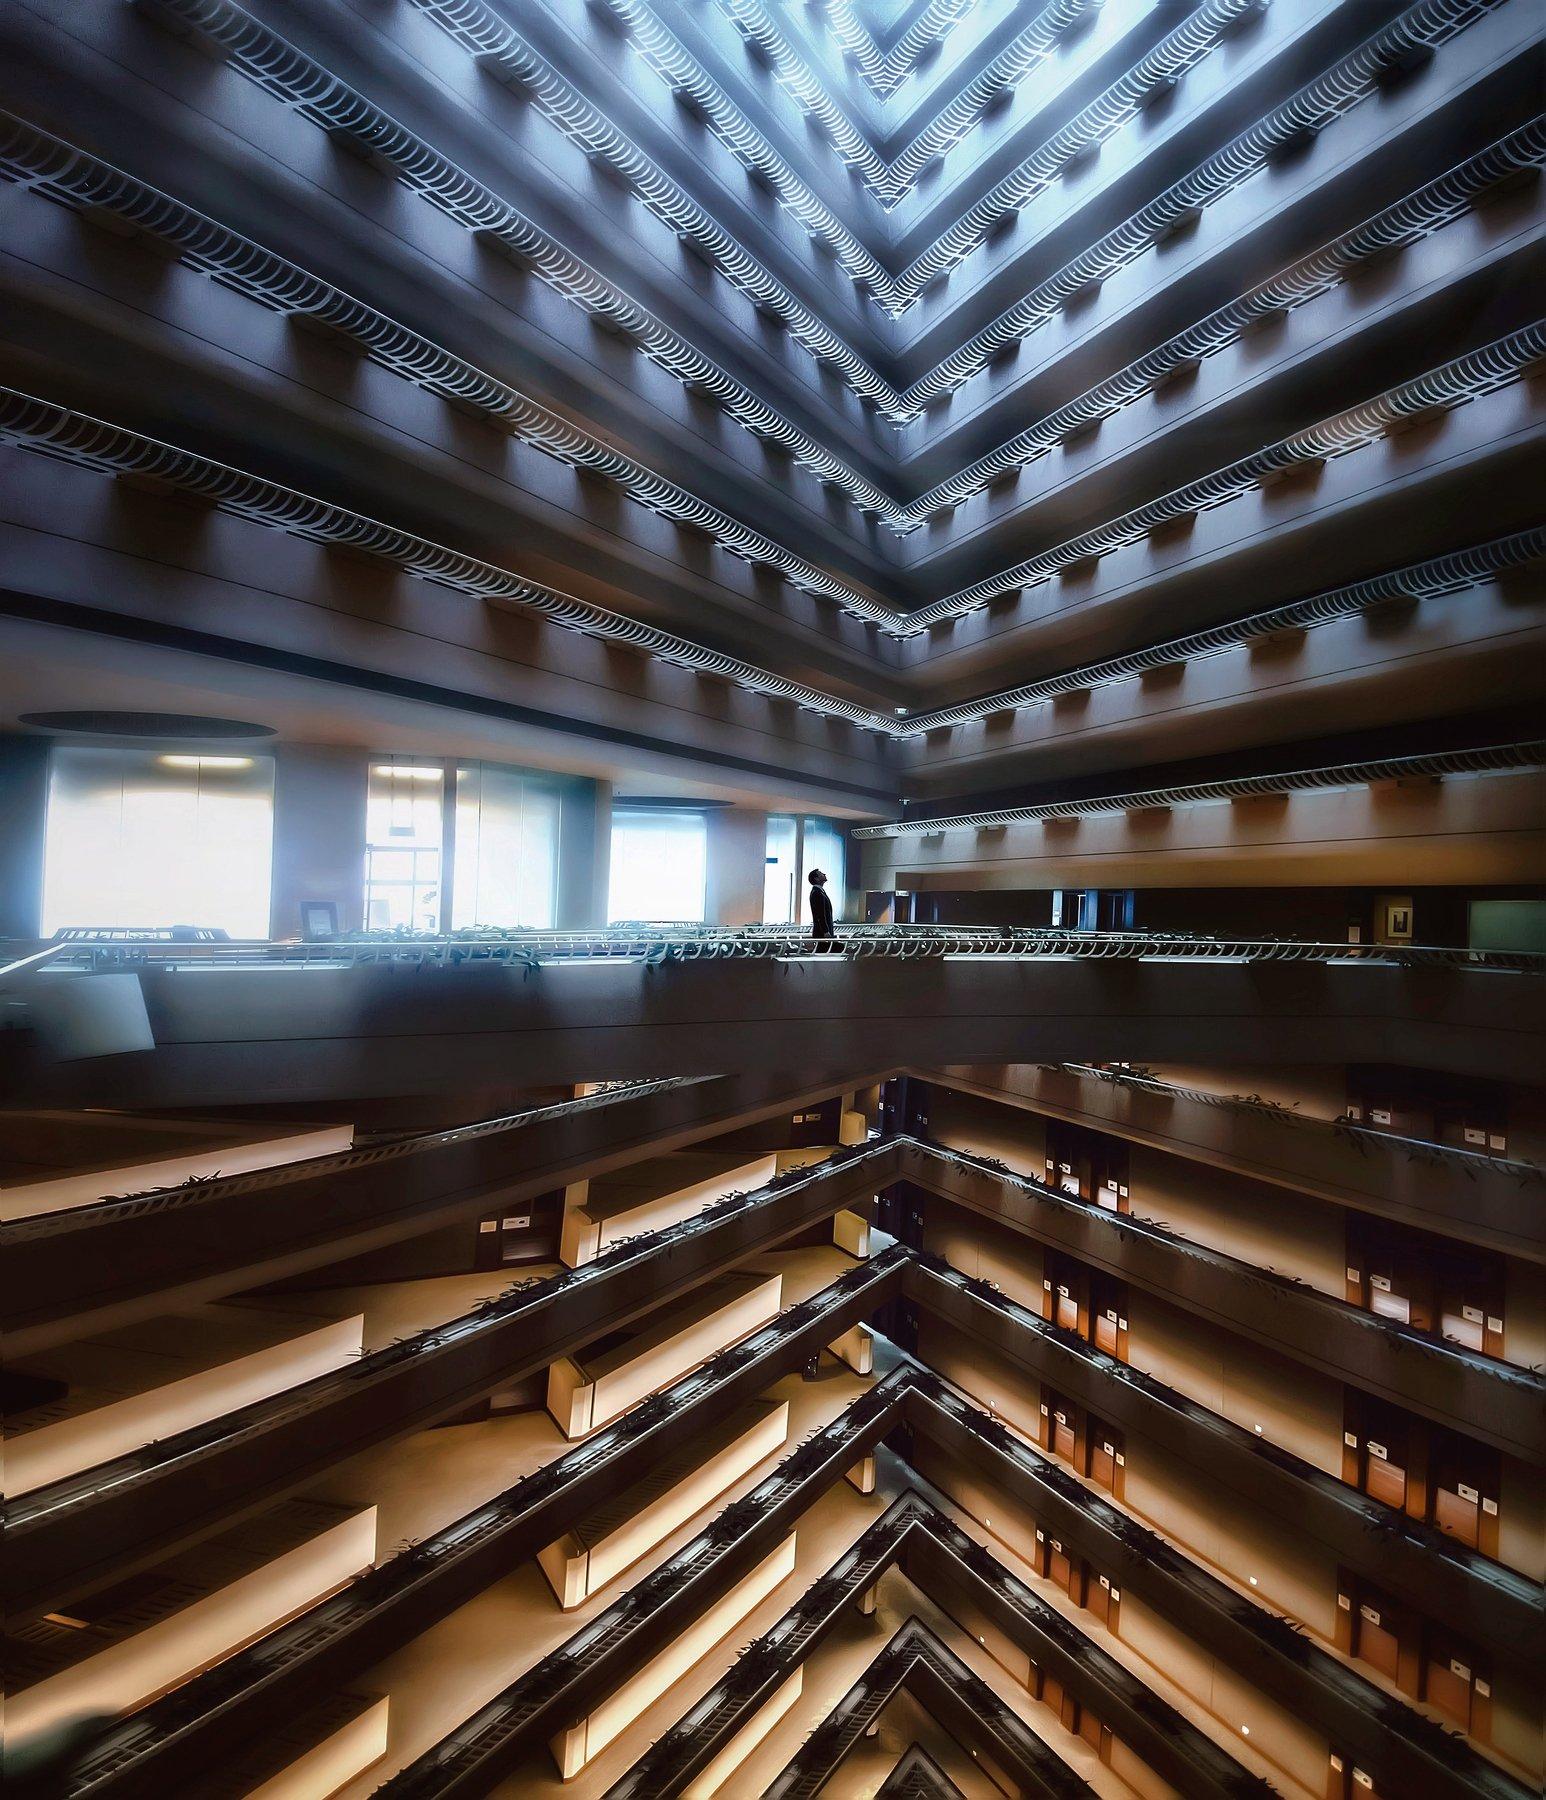 симметрия, архитектура, атриум, сингапур, Алексей Ермаков